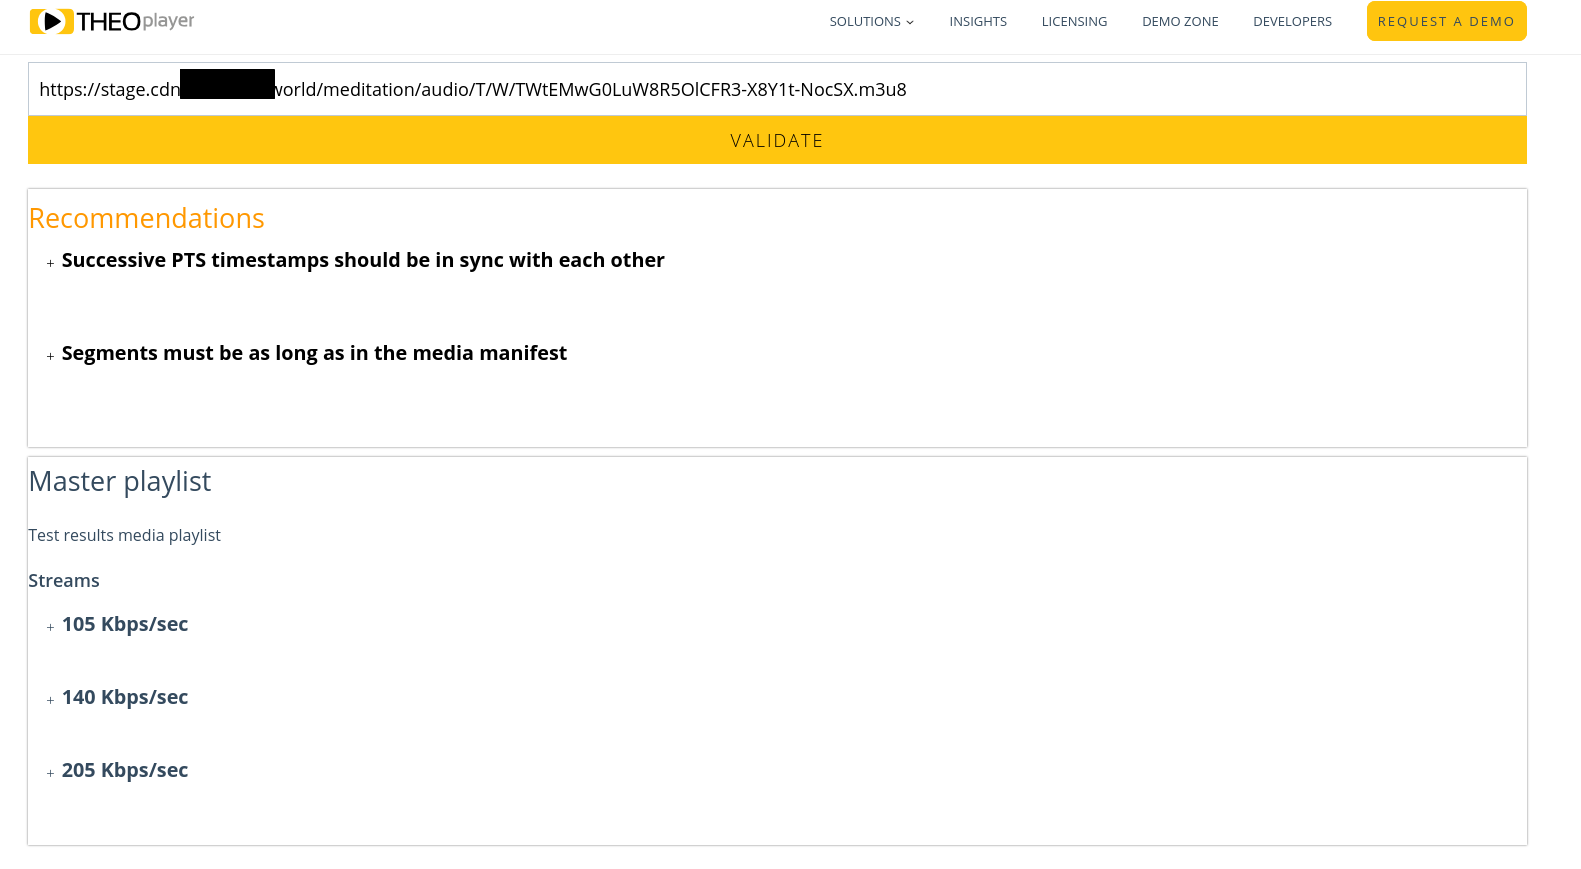 AWS: CloudFront и S3 — No 'Access-Control-Allow-Origin' header is